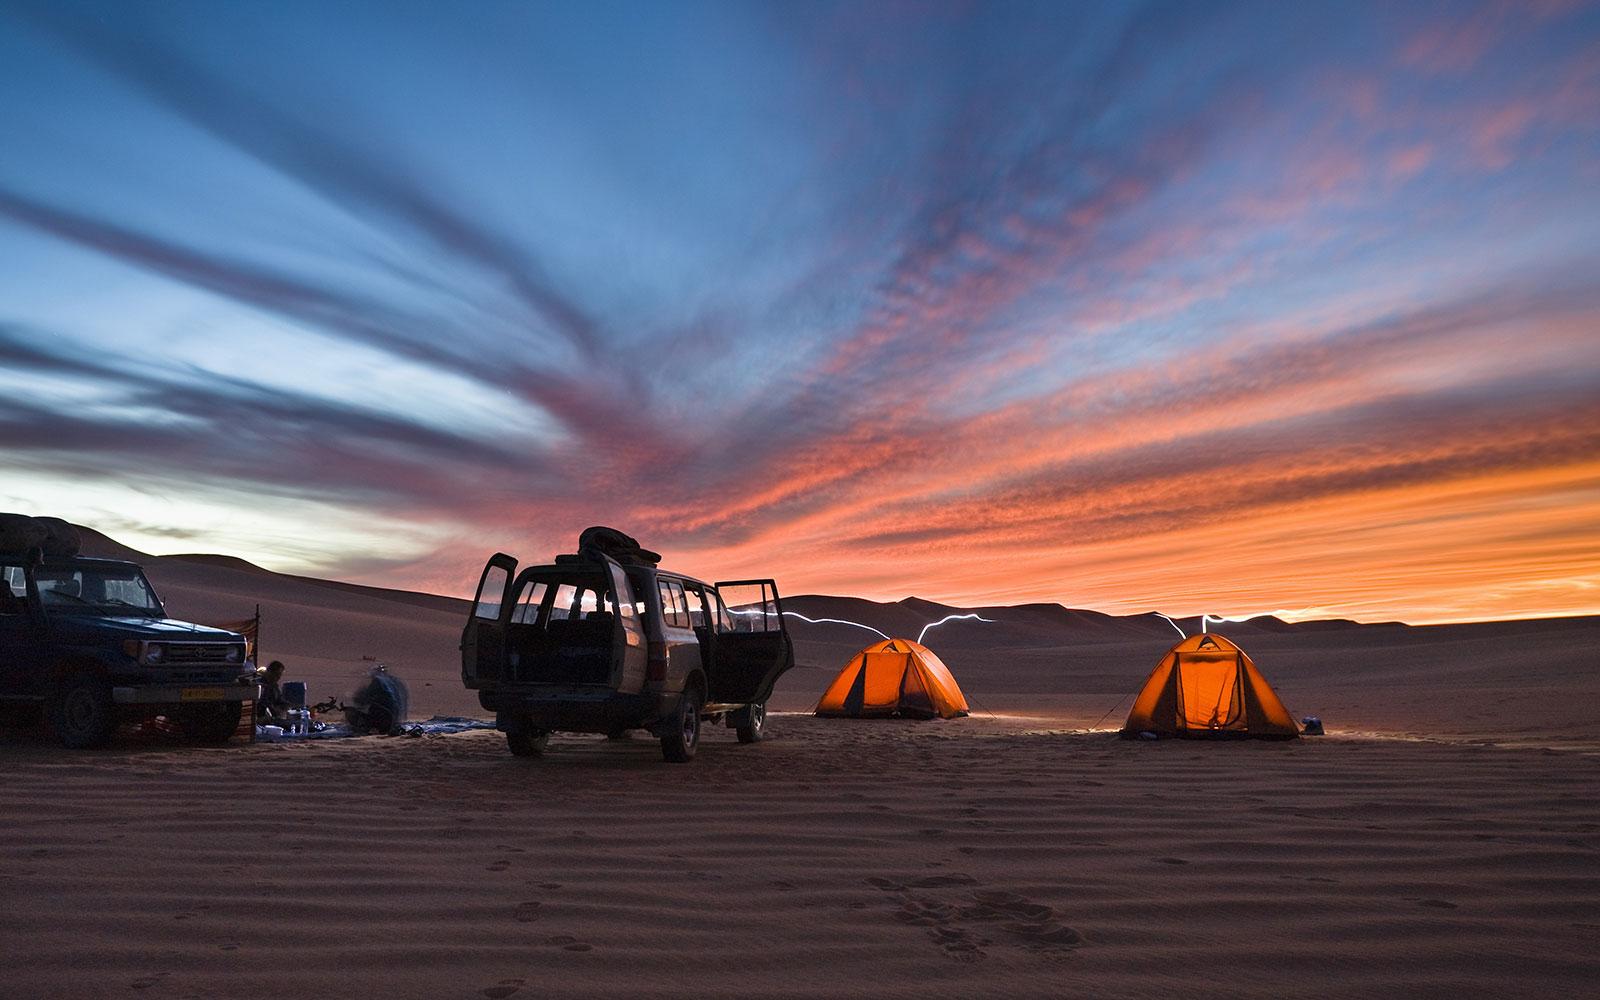 camping in the libyan desert, Libya, Sahara, Africa